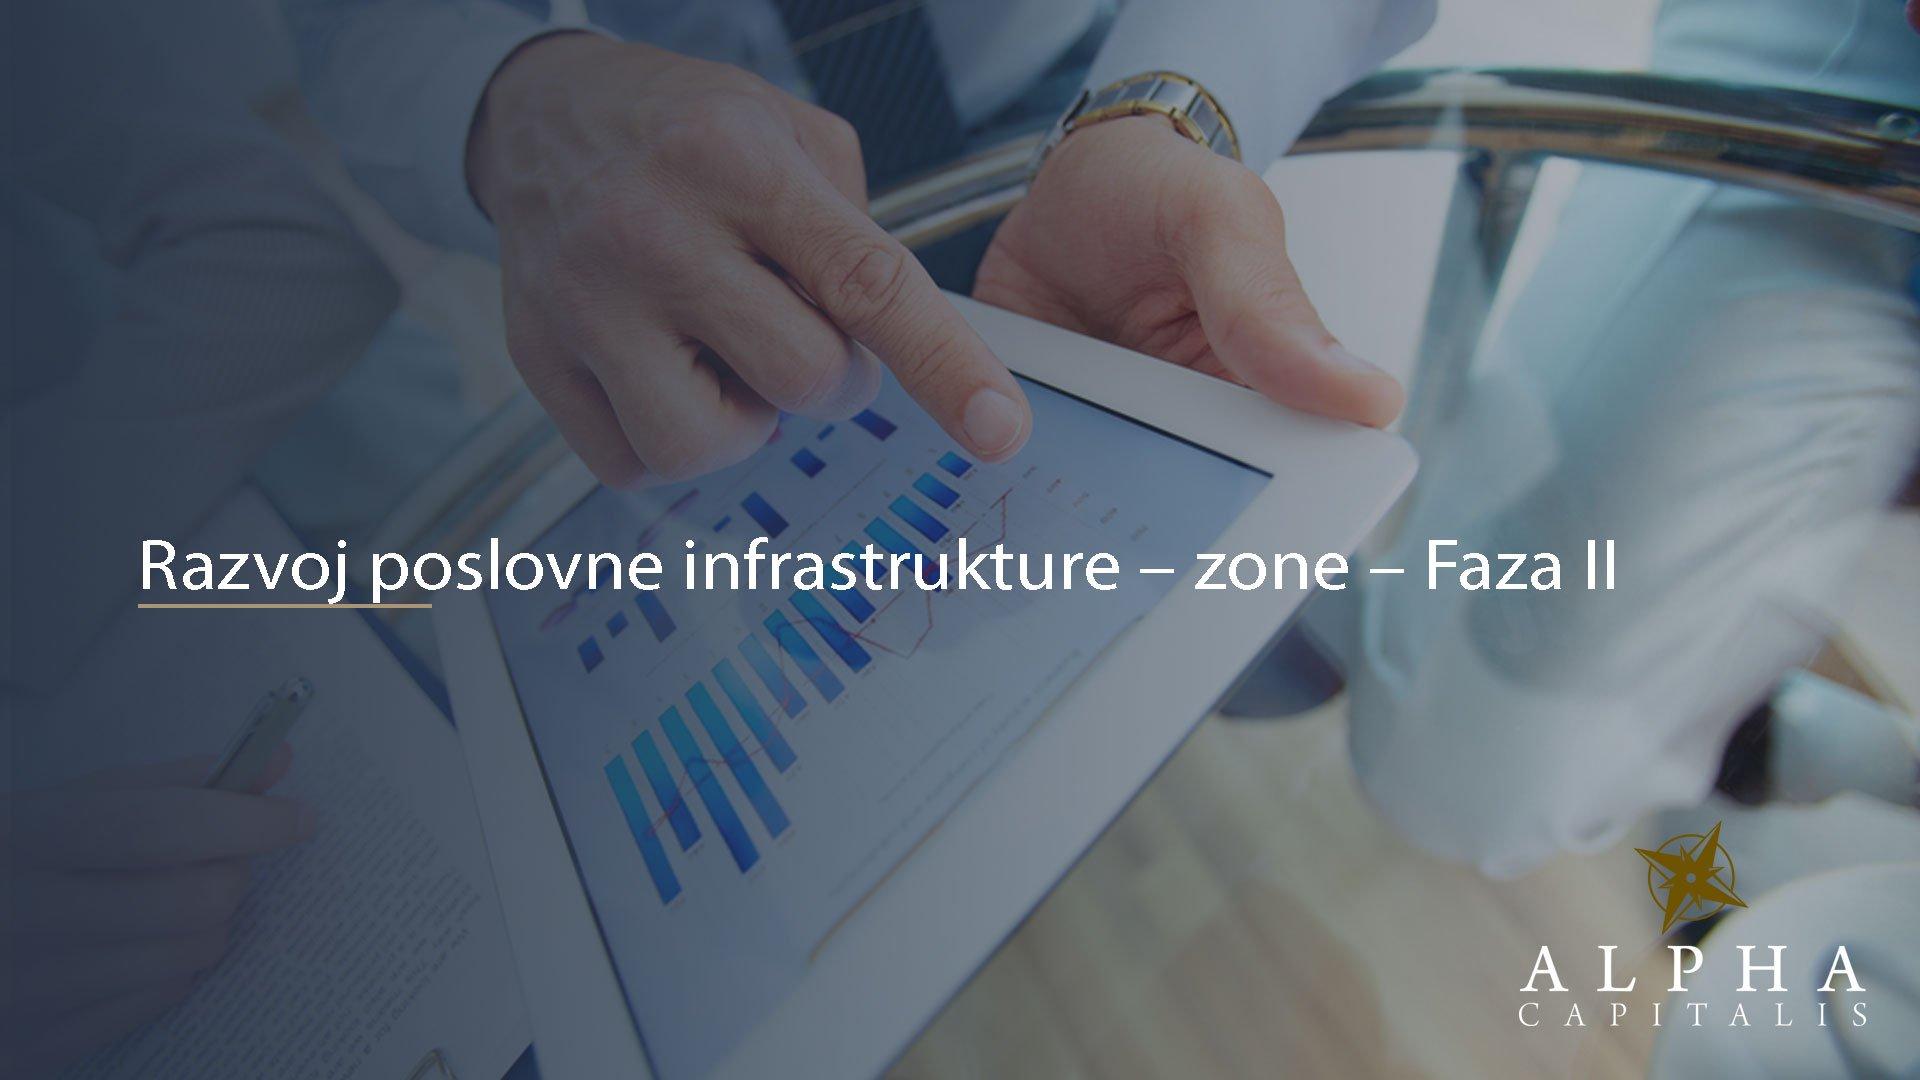 alpha-capitalis-Razvoj-poslovne-infrastrukture-–-zone-–-Faza-II